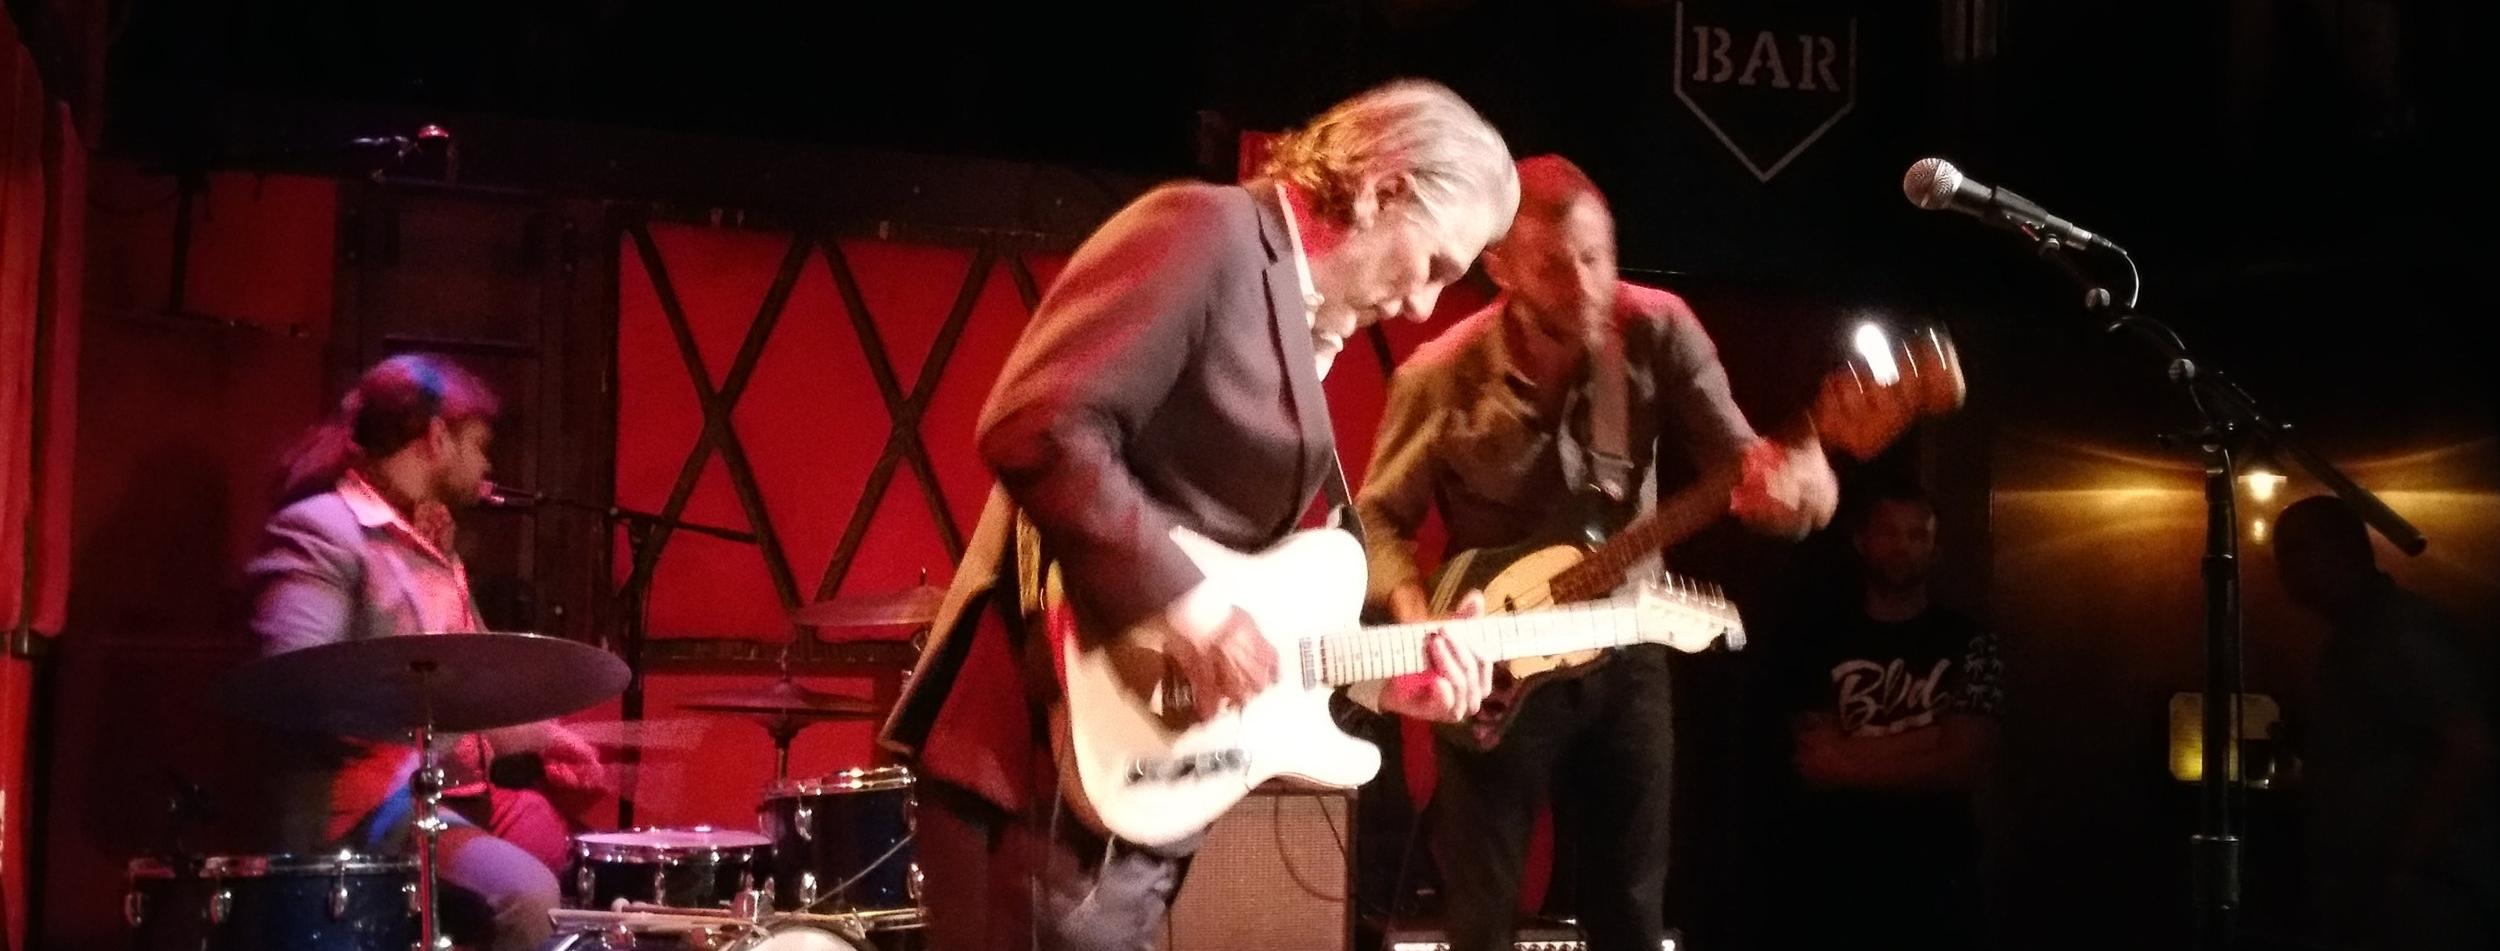 Jts Jazz Implosion Featuring Jim Campilongo Trio W Chris Morrissey